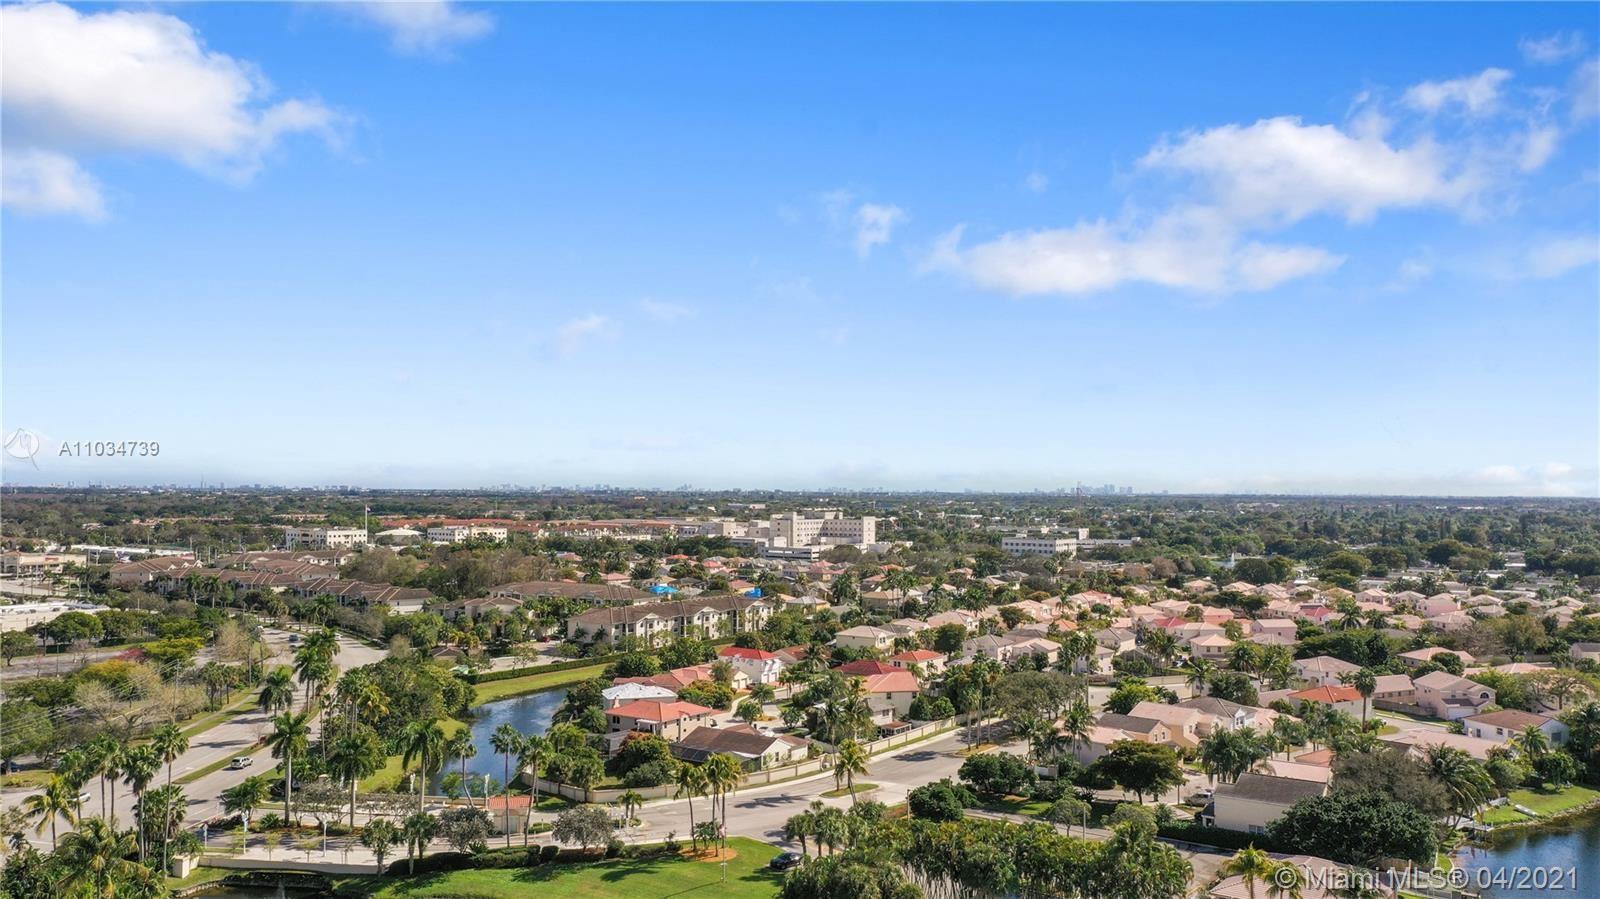 Photo of 6203 Buena Vista Dr, Margate, FL 33063 (MLS # A11034739)